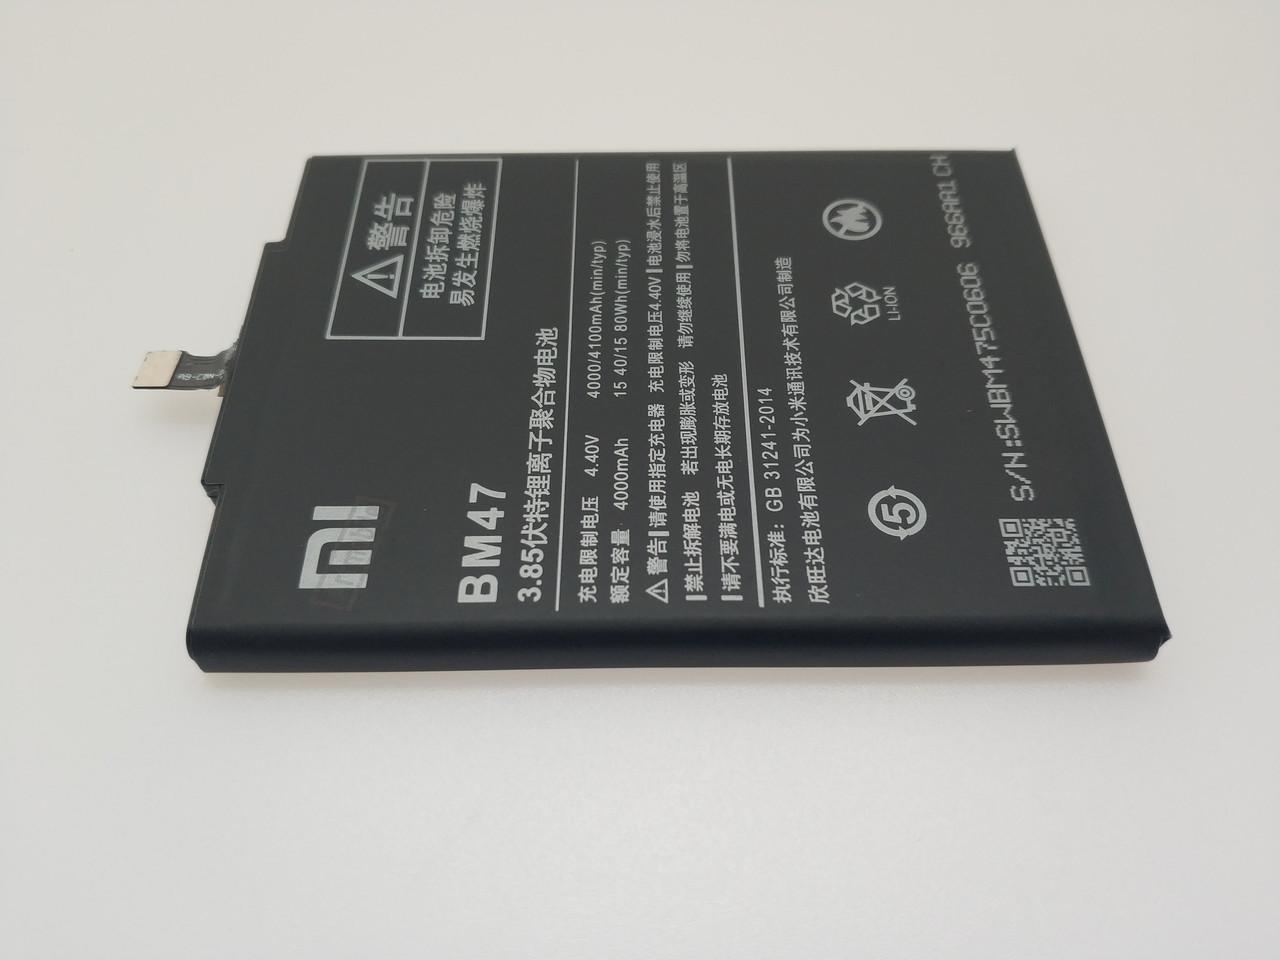 Аккумулятор Xiaomi для серии телефов Redmi 4000mAh BM47 (MB_723325609)